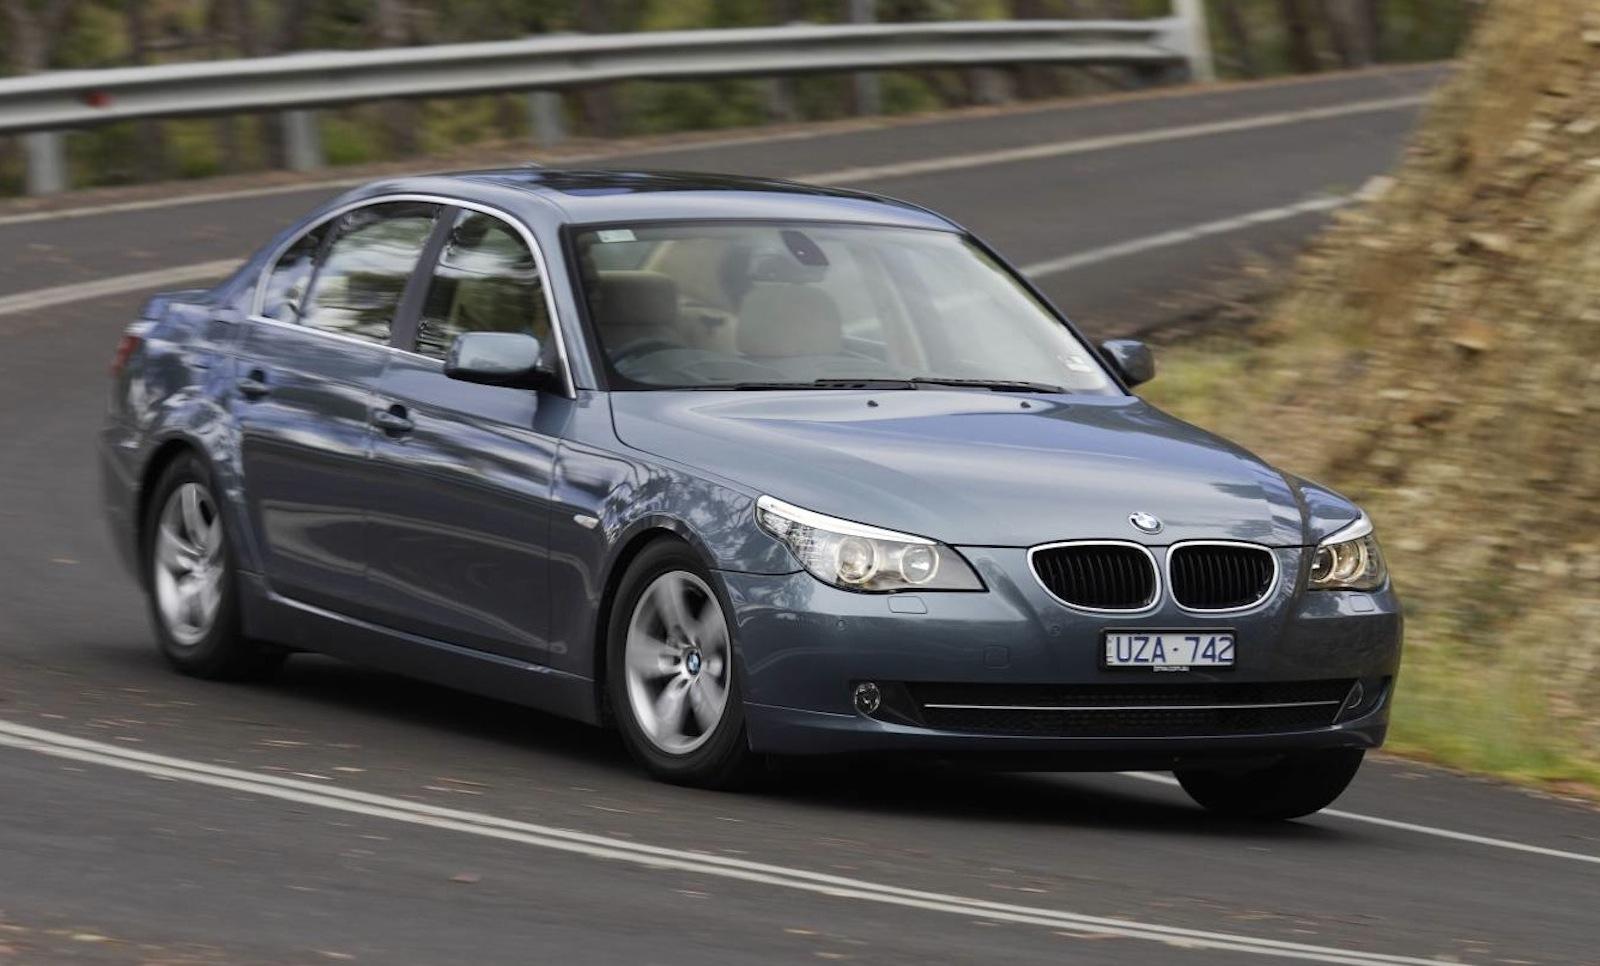 bmw 5-series, 6-series recalled in australia: 10,000 vehicles